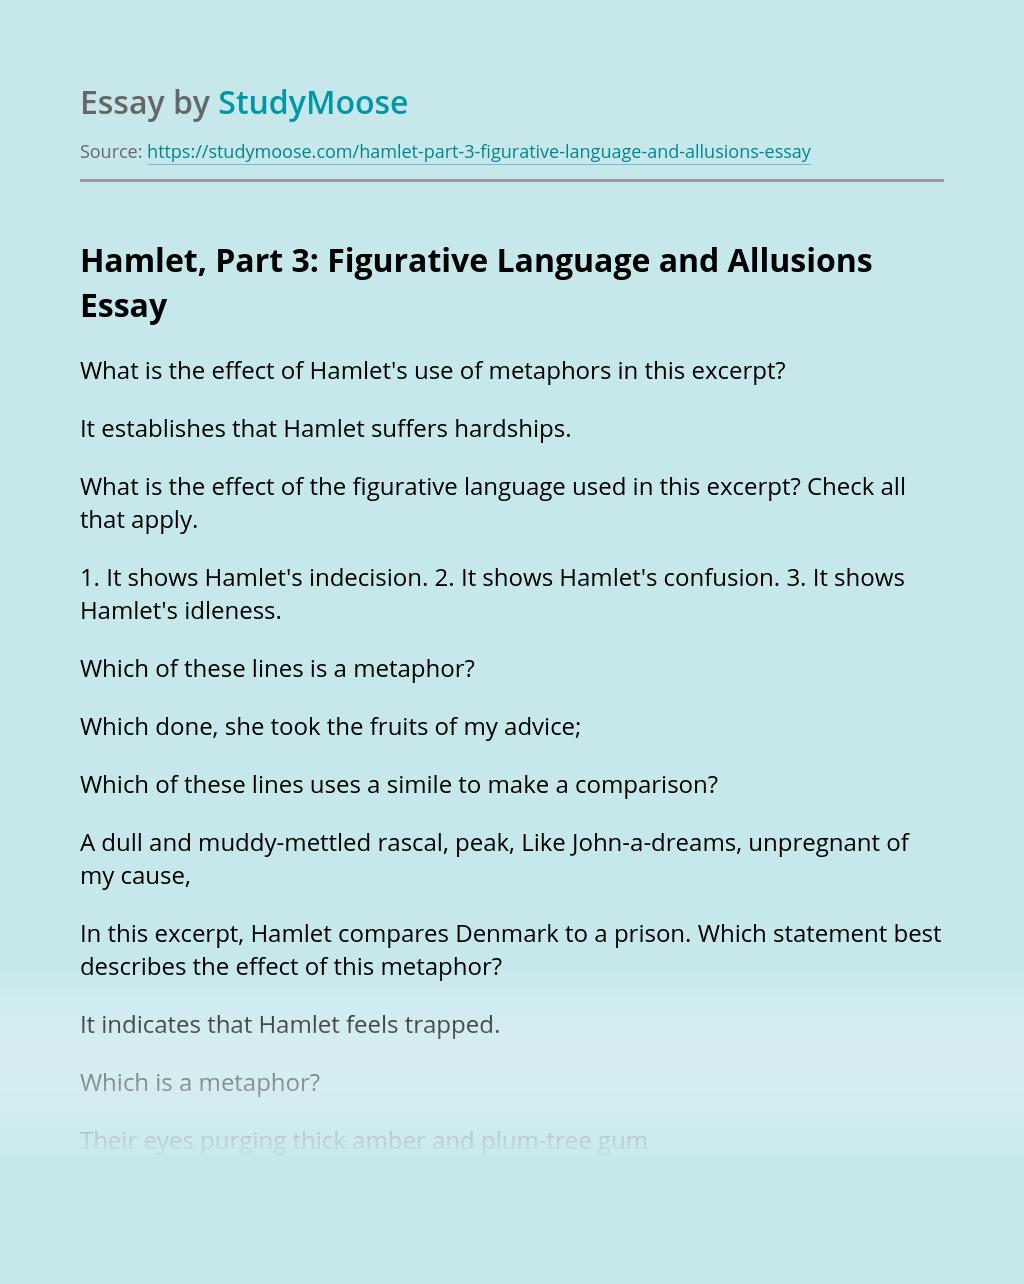 Hamlet, Part 3: Figurative Language and Allusions